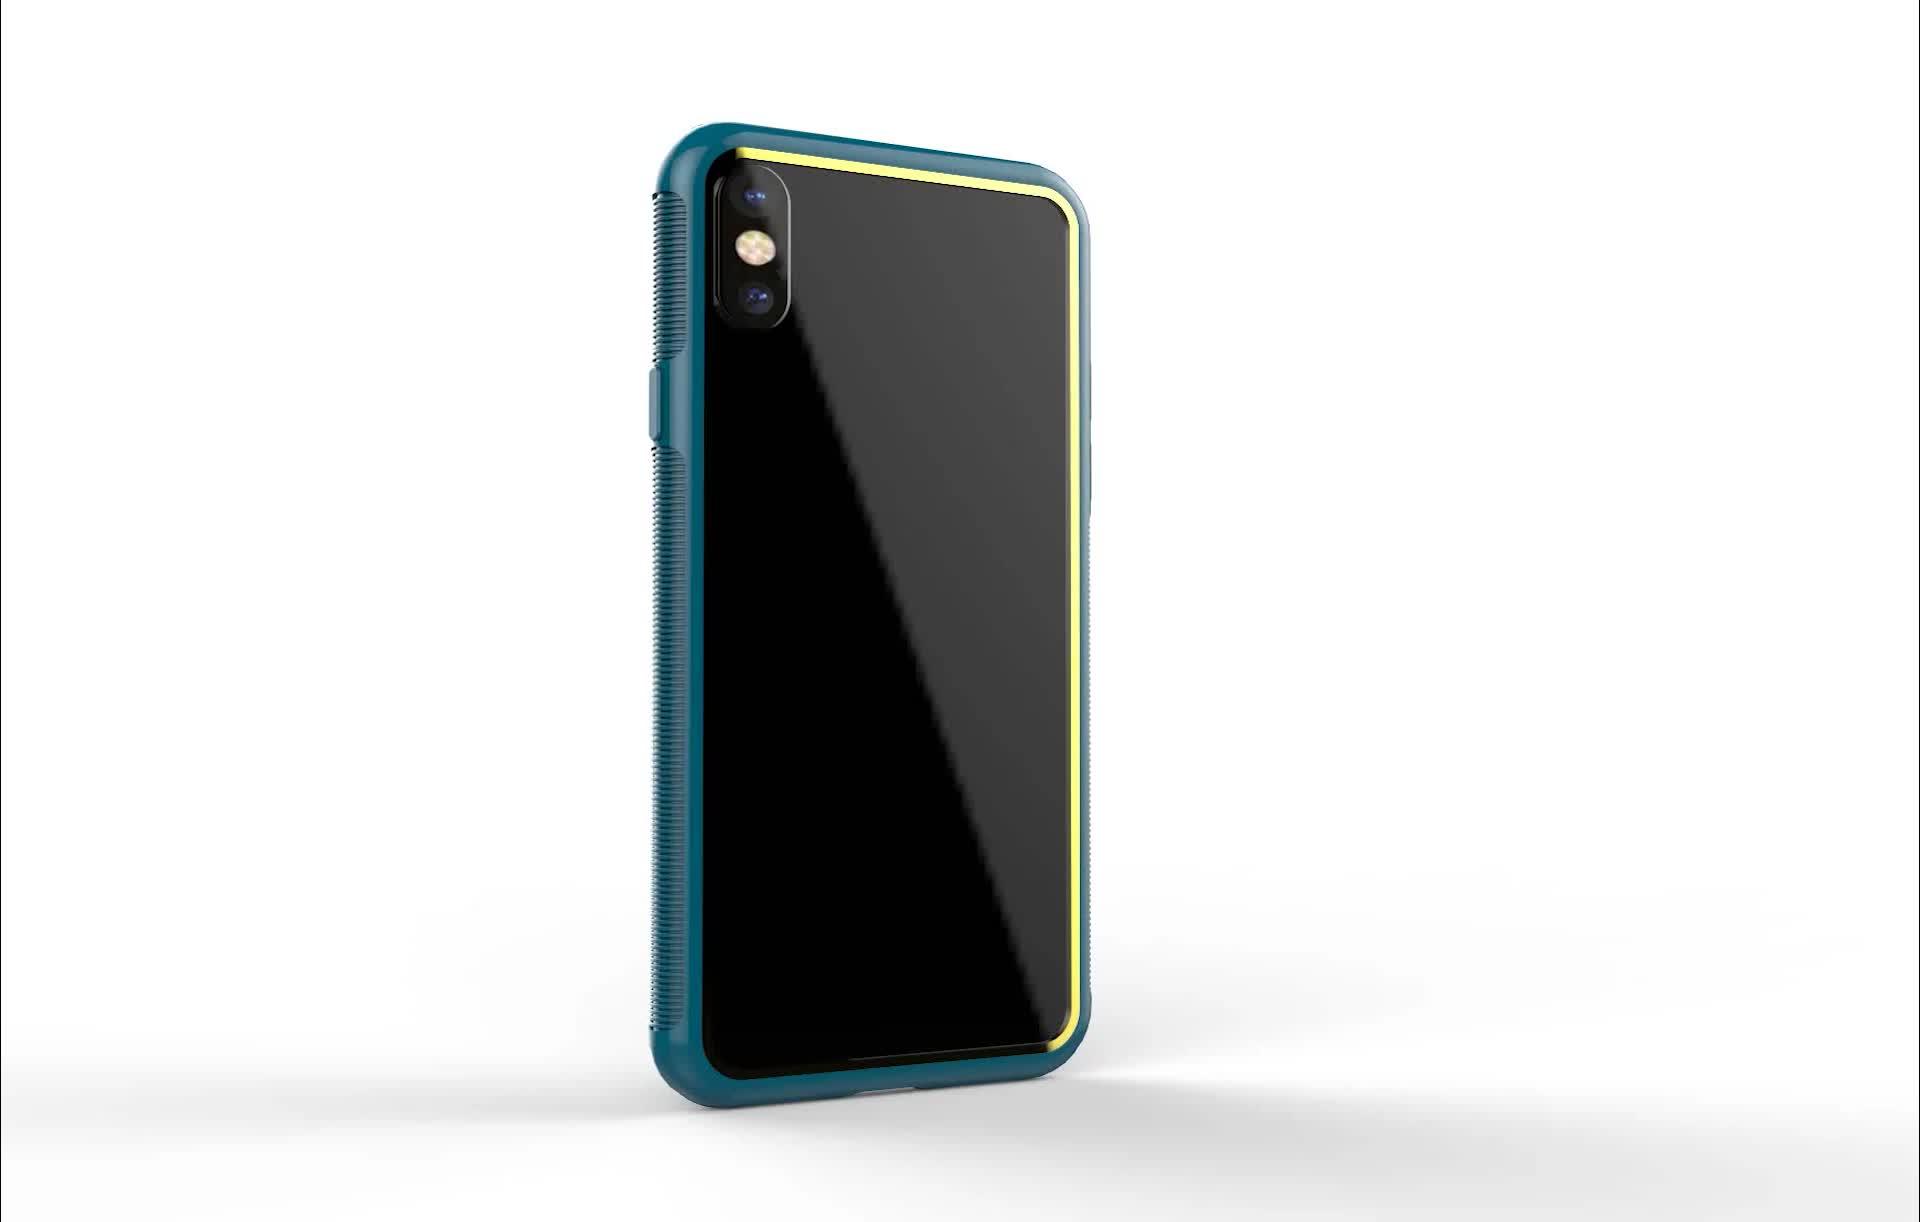 super popular 1328d 3475d Amazon Hot Sale 2 In 1 Tpu Bumper Case Hybrid Mobile Back Cover Custom  Phone Cases For Iphone X Case - Buy For Iphone X Case,Custom Phone  Cases,Back ...